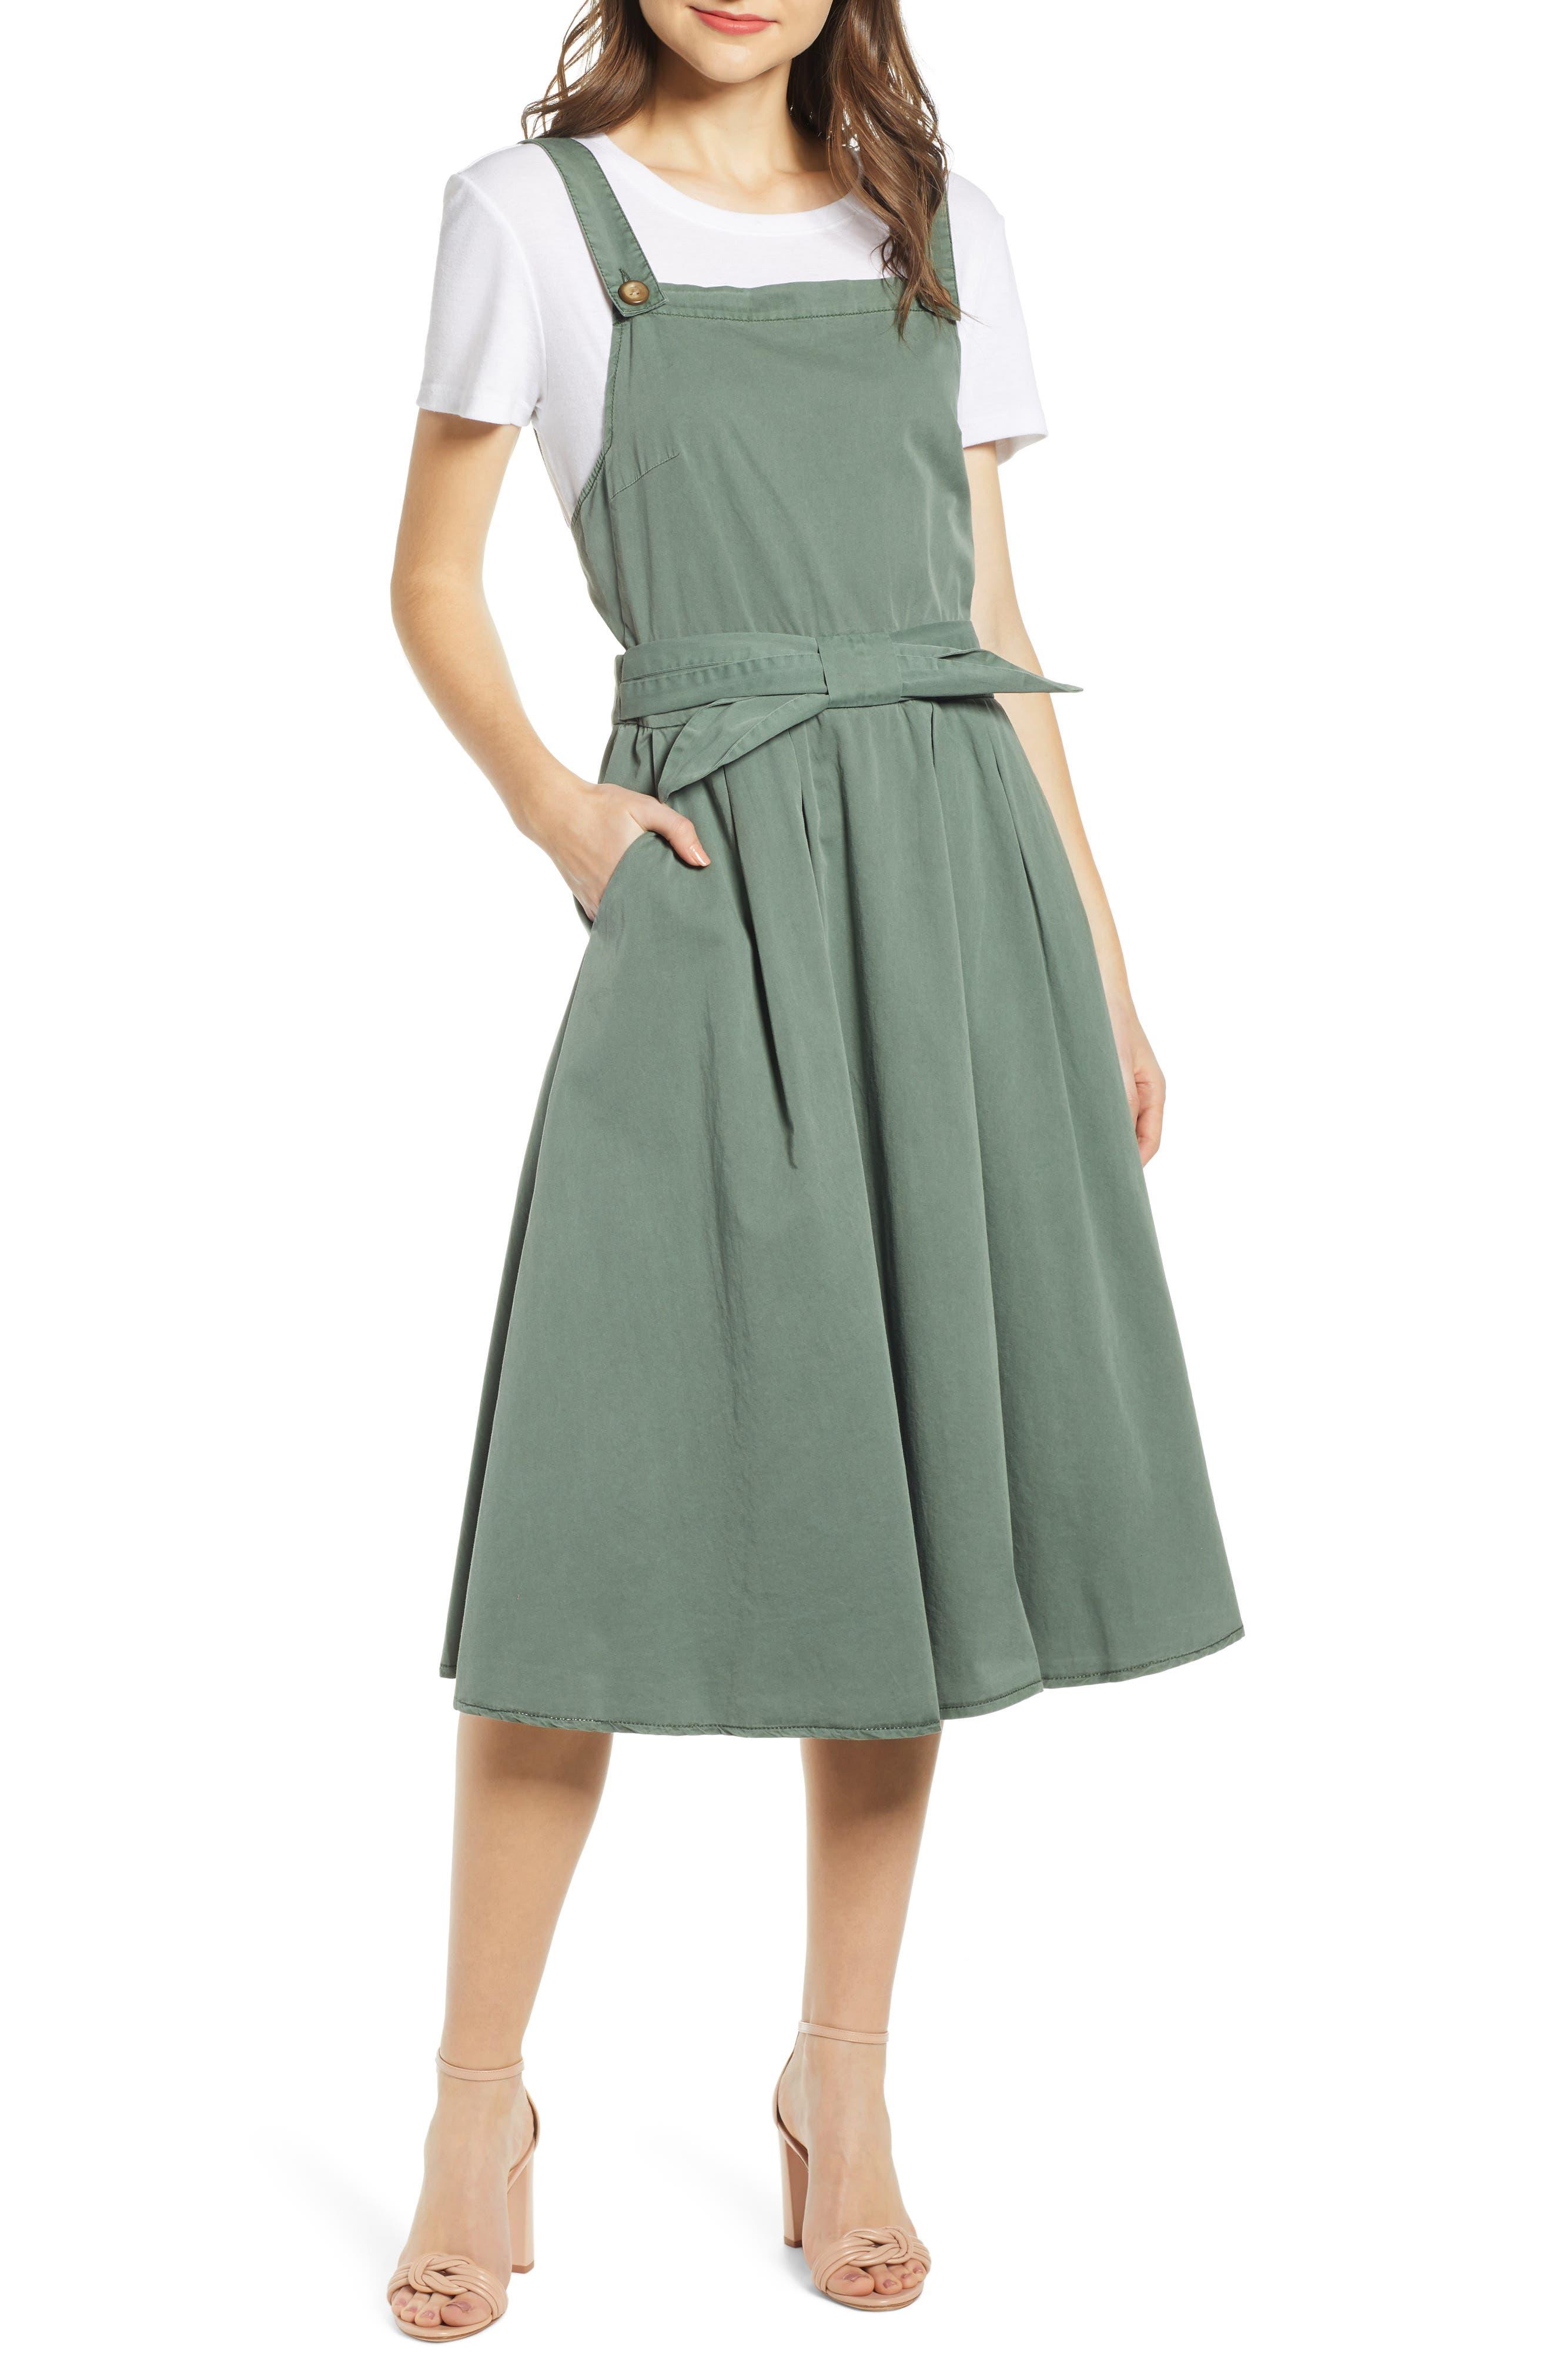 Vero Moda Flame Bow Front Cotton Jumper Dress, Green